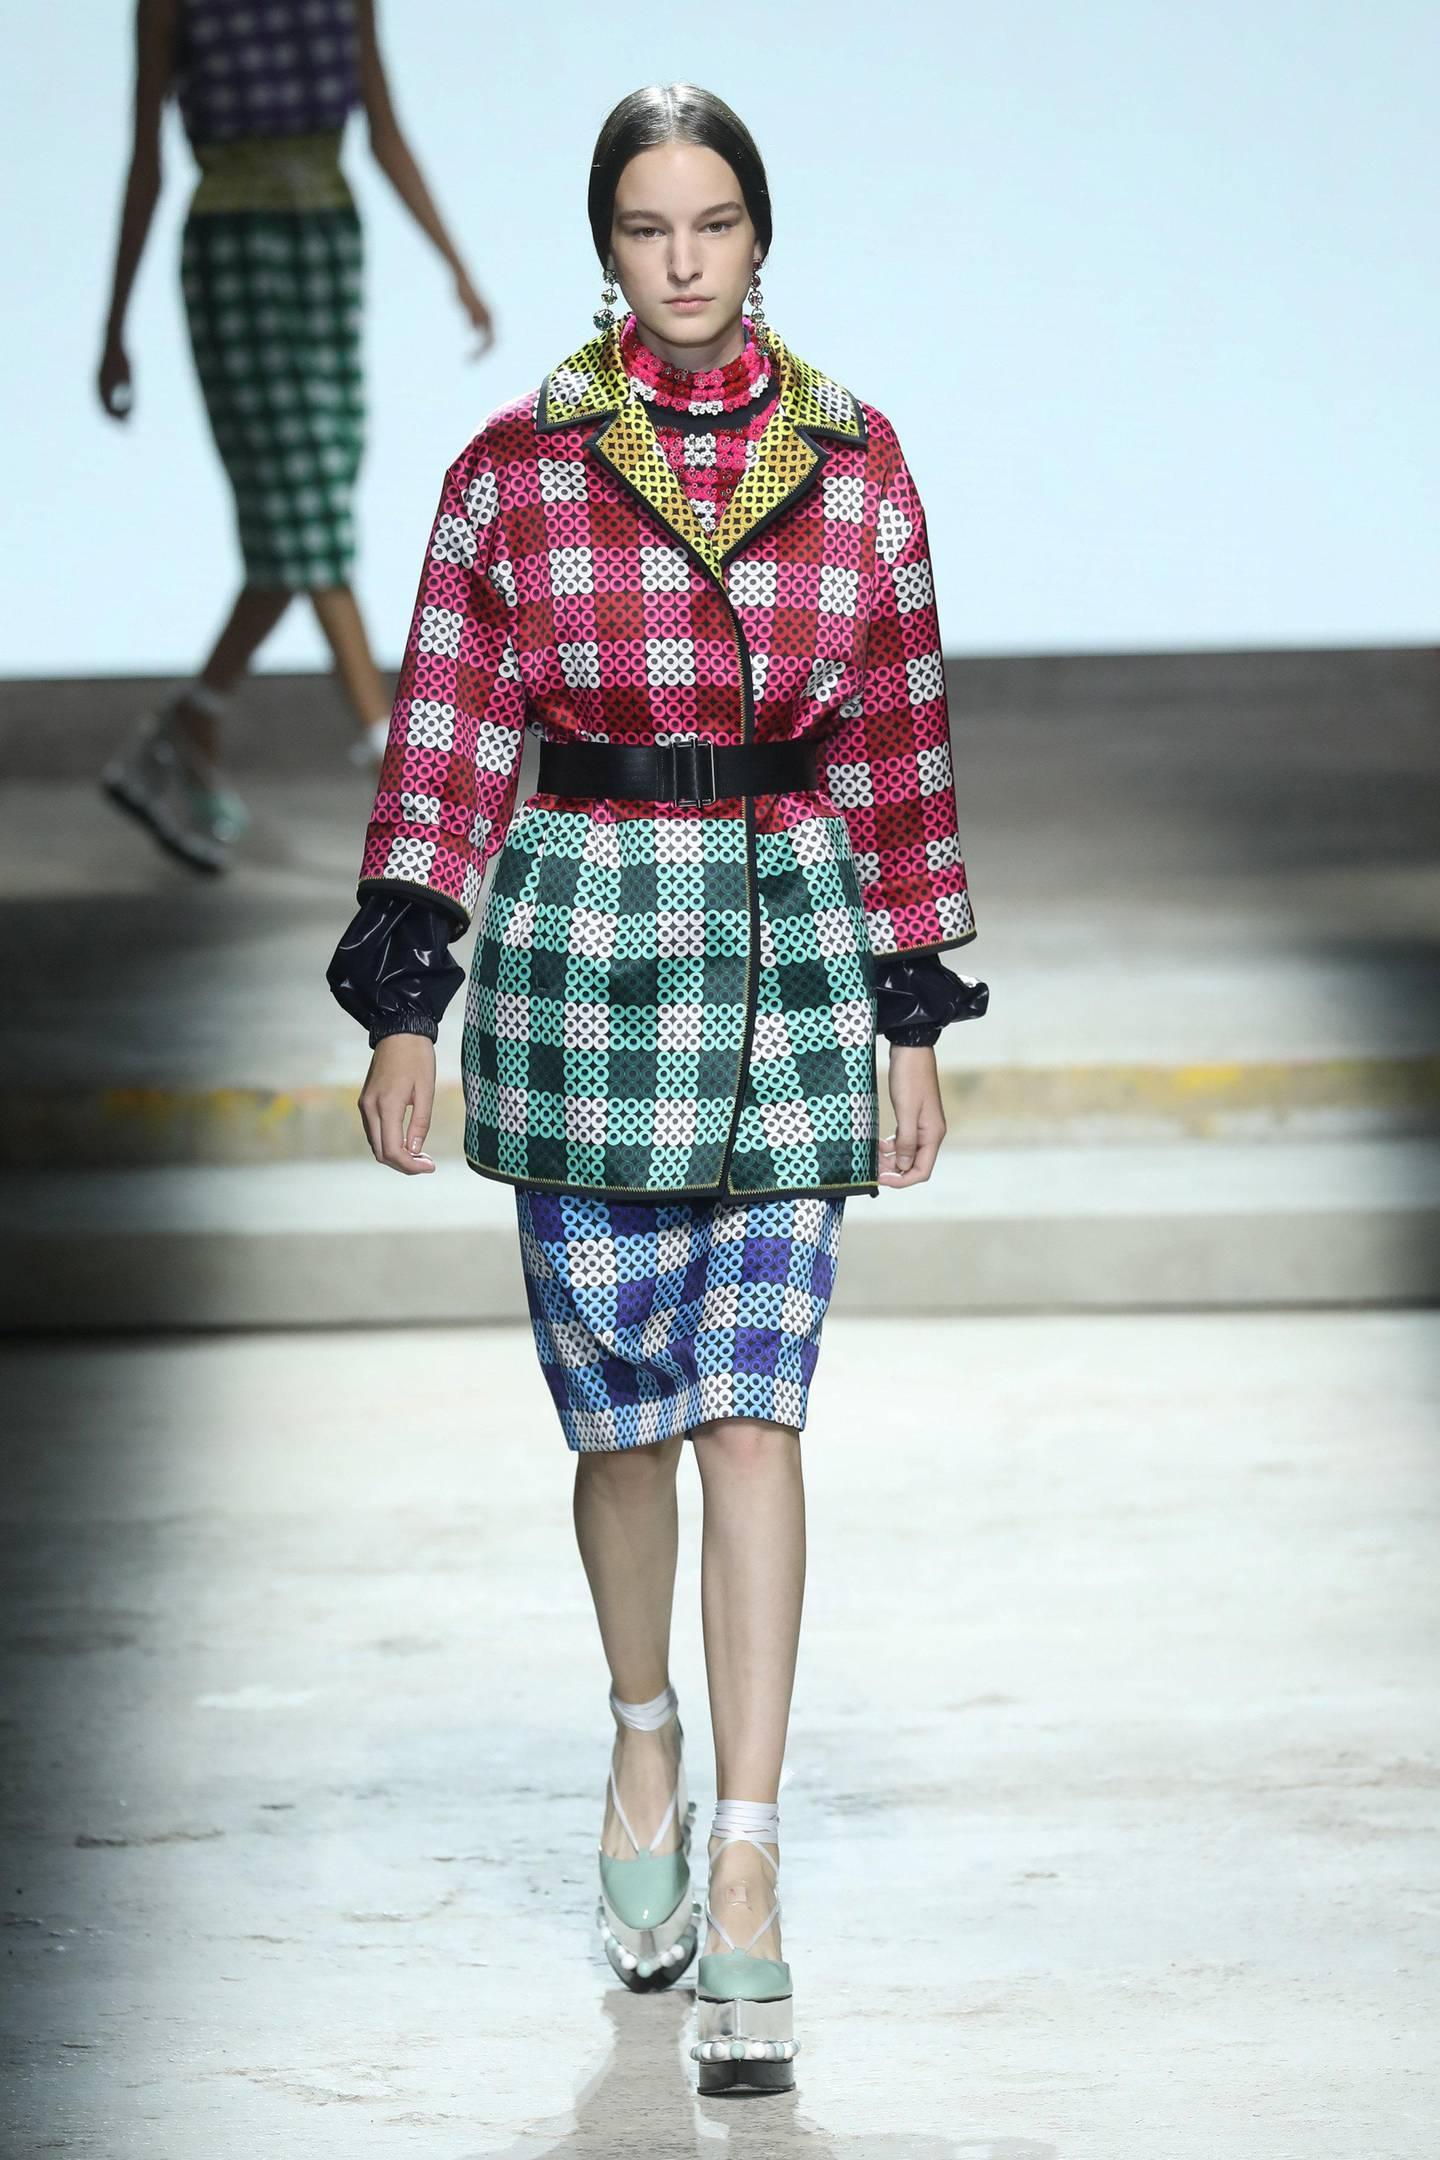 LONDON, ENGLAND - SEPTEMBER 17:  A model walks the runway at the Mary Katrantzou show during London Fashion Week September 2017 on September 17, 2017 in London, England.  (Photo by Antonio de Moraes Barros Filho/WireImage)